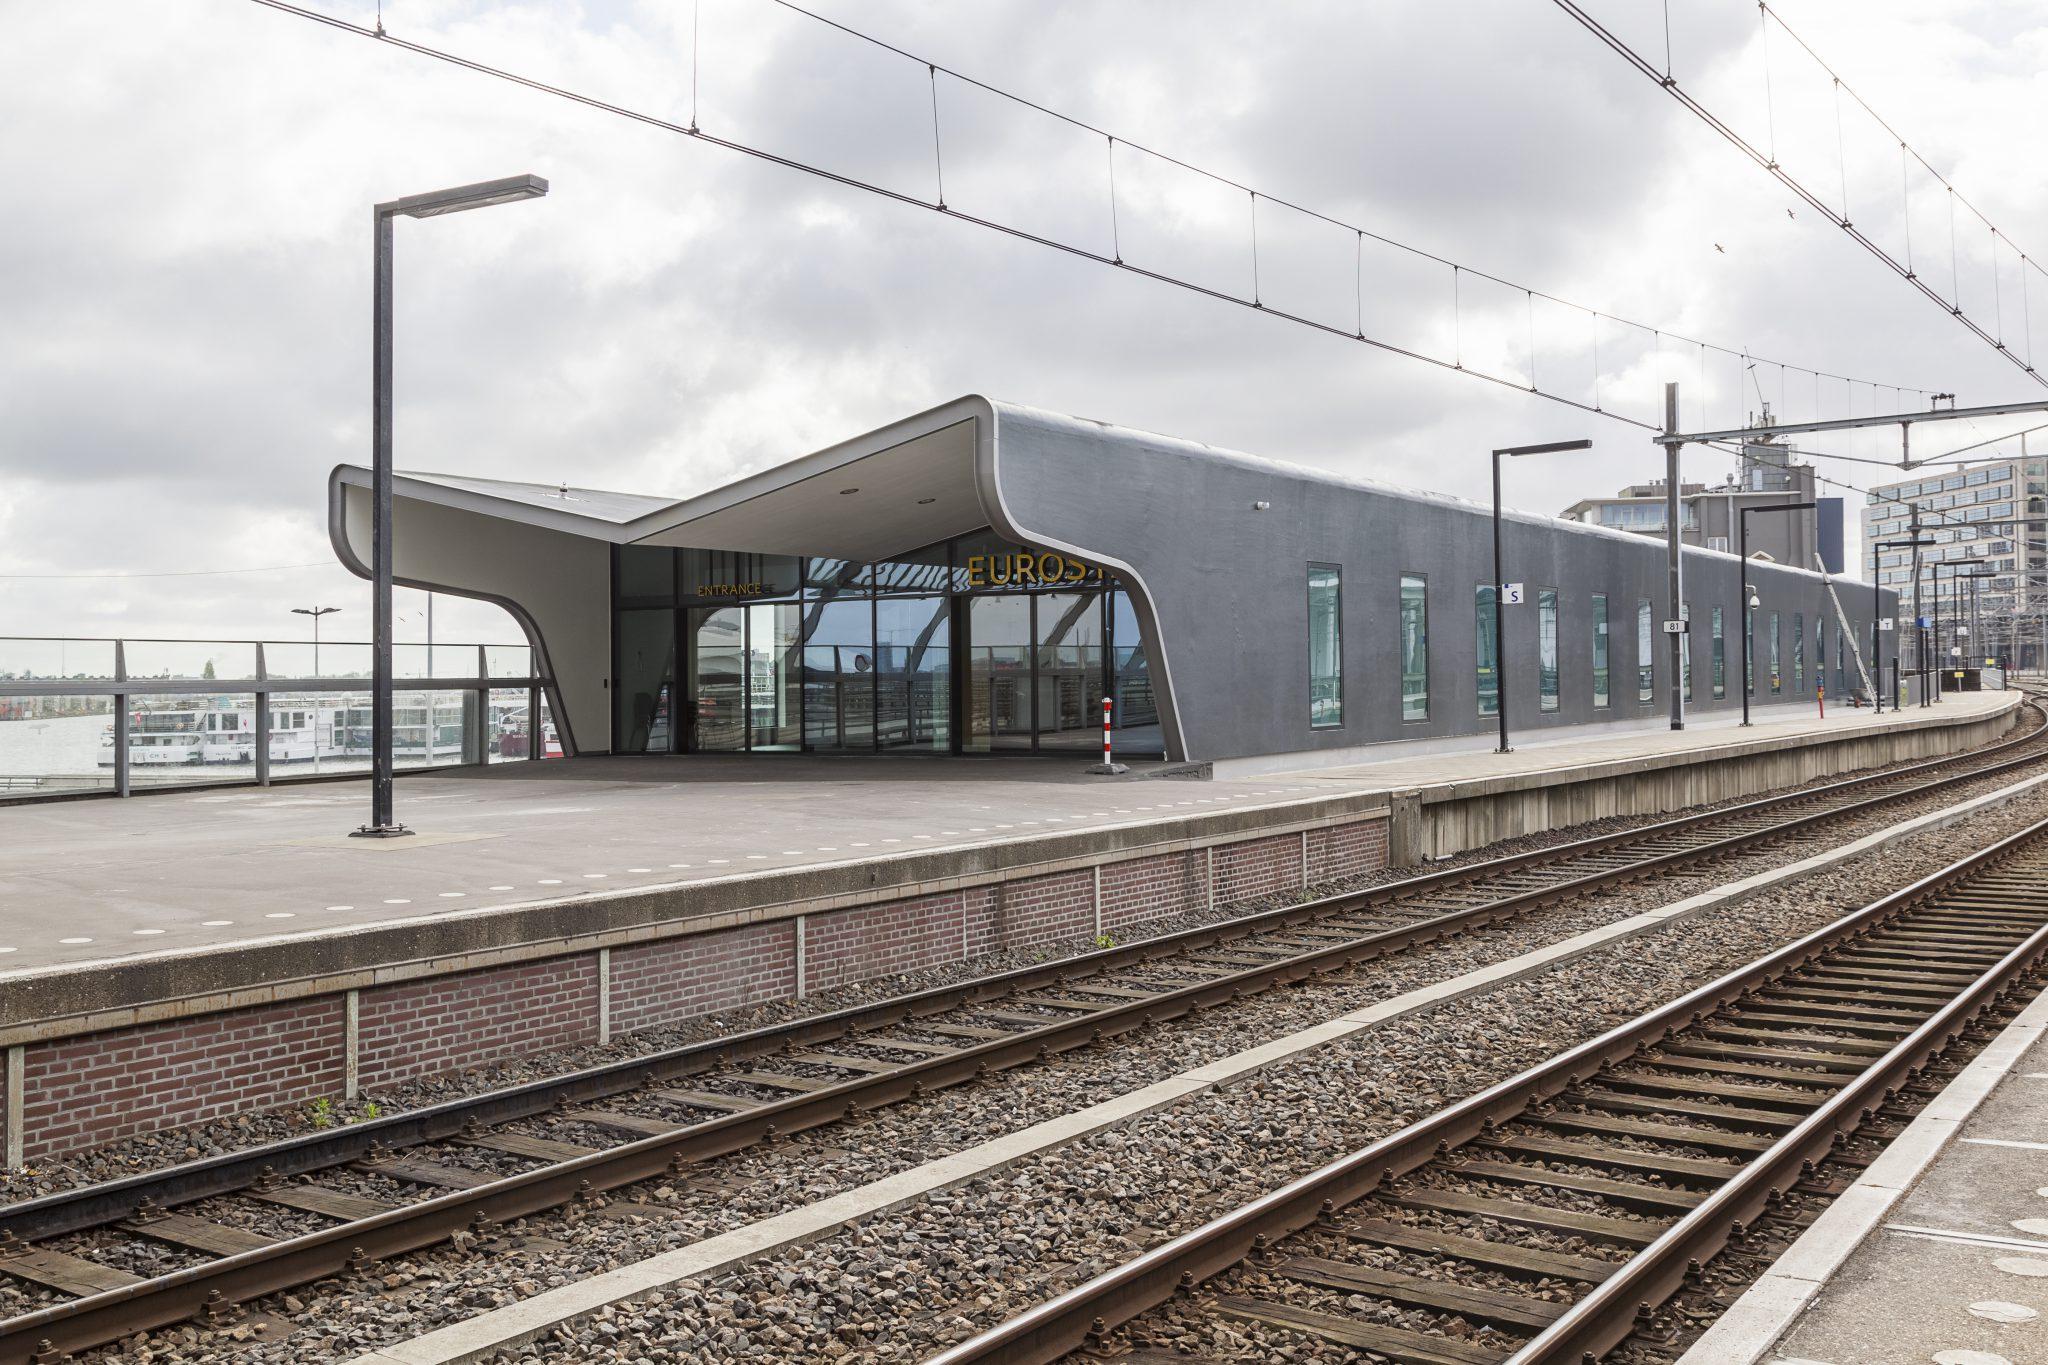 perron Terminal Eurostar op talud perron Amsterdam CS